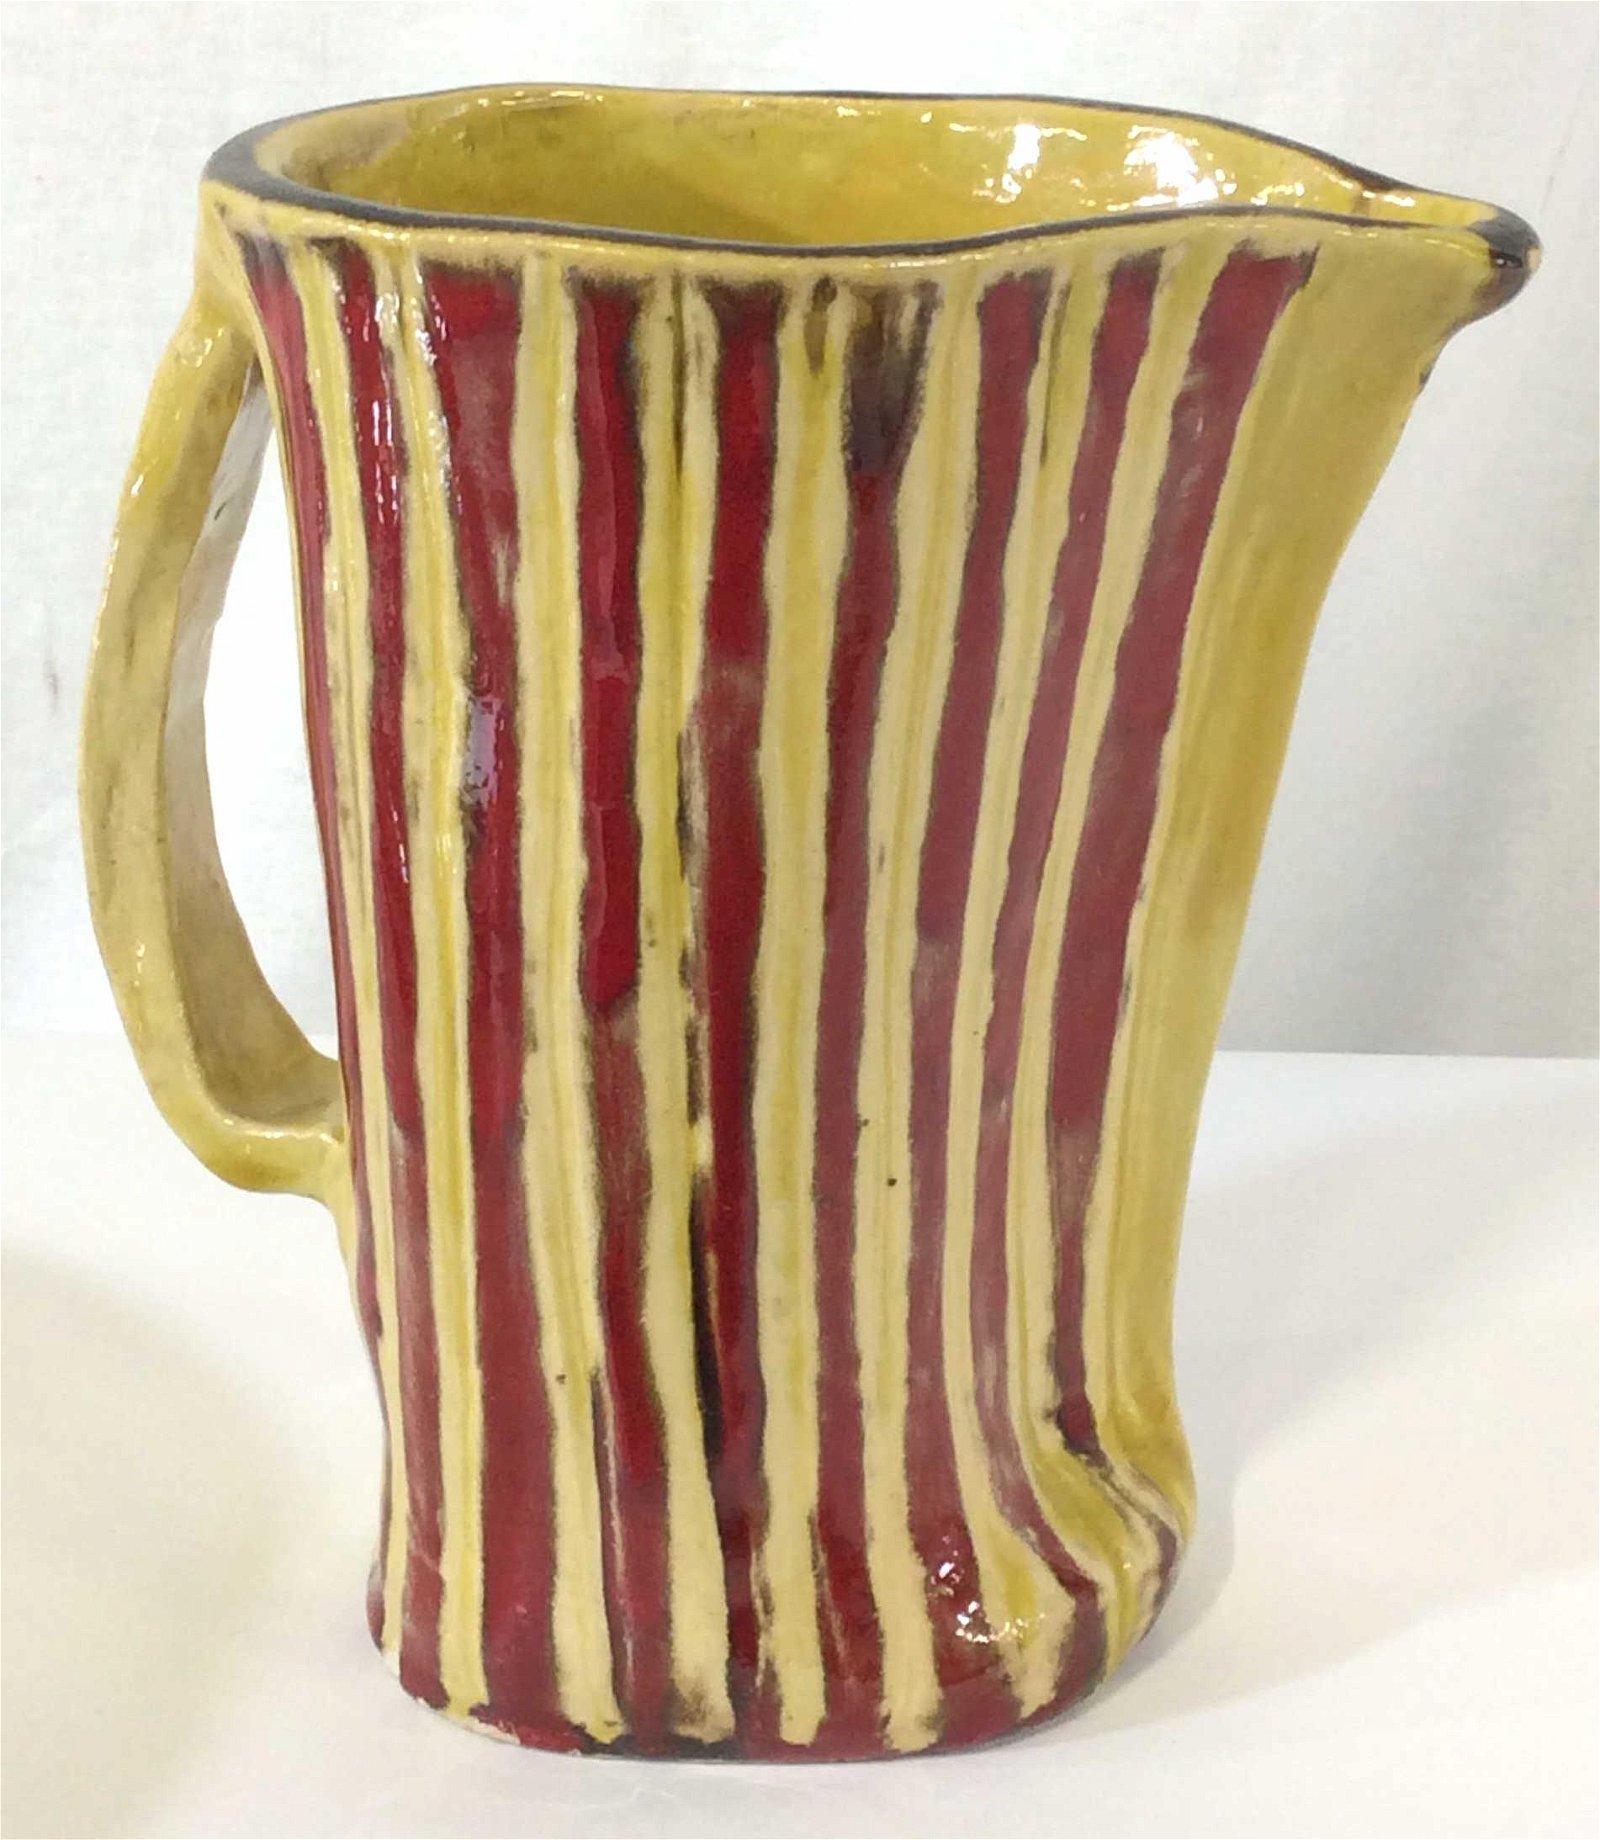 Artist Signed Glazed Ceramic Pitcher